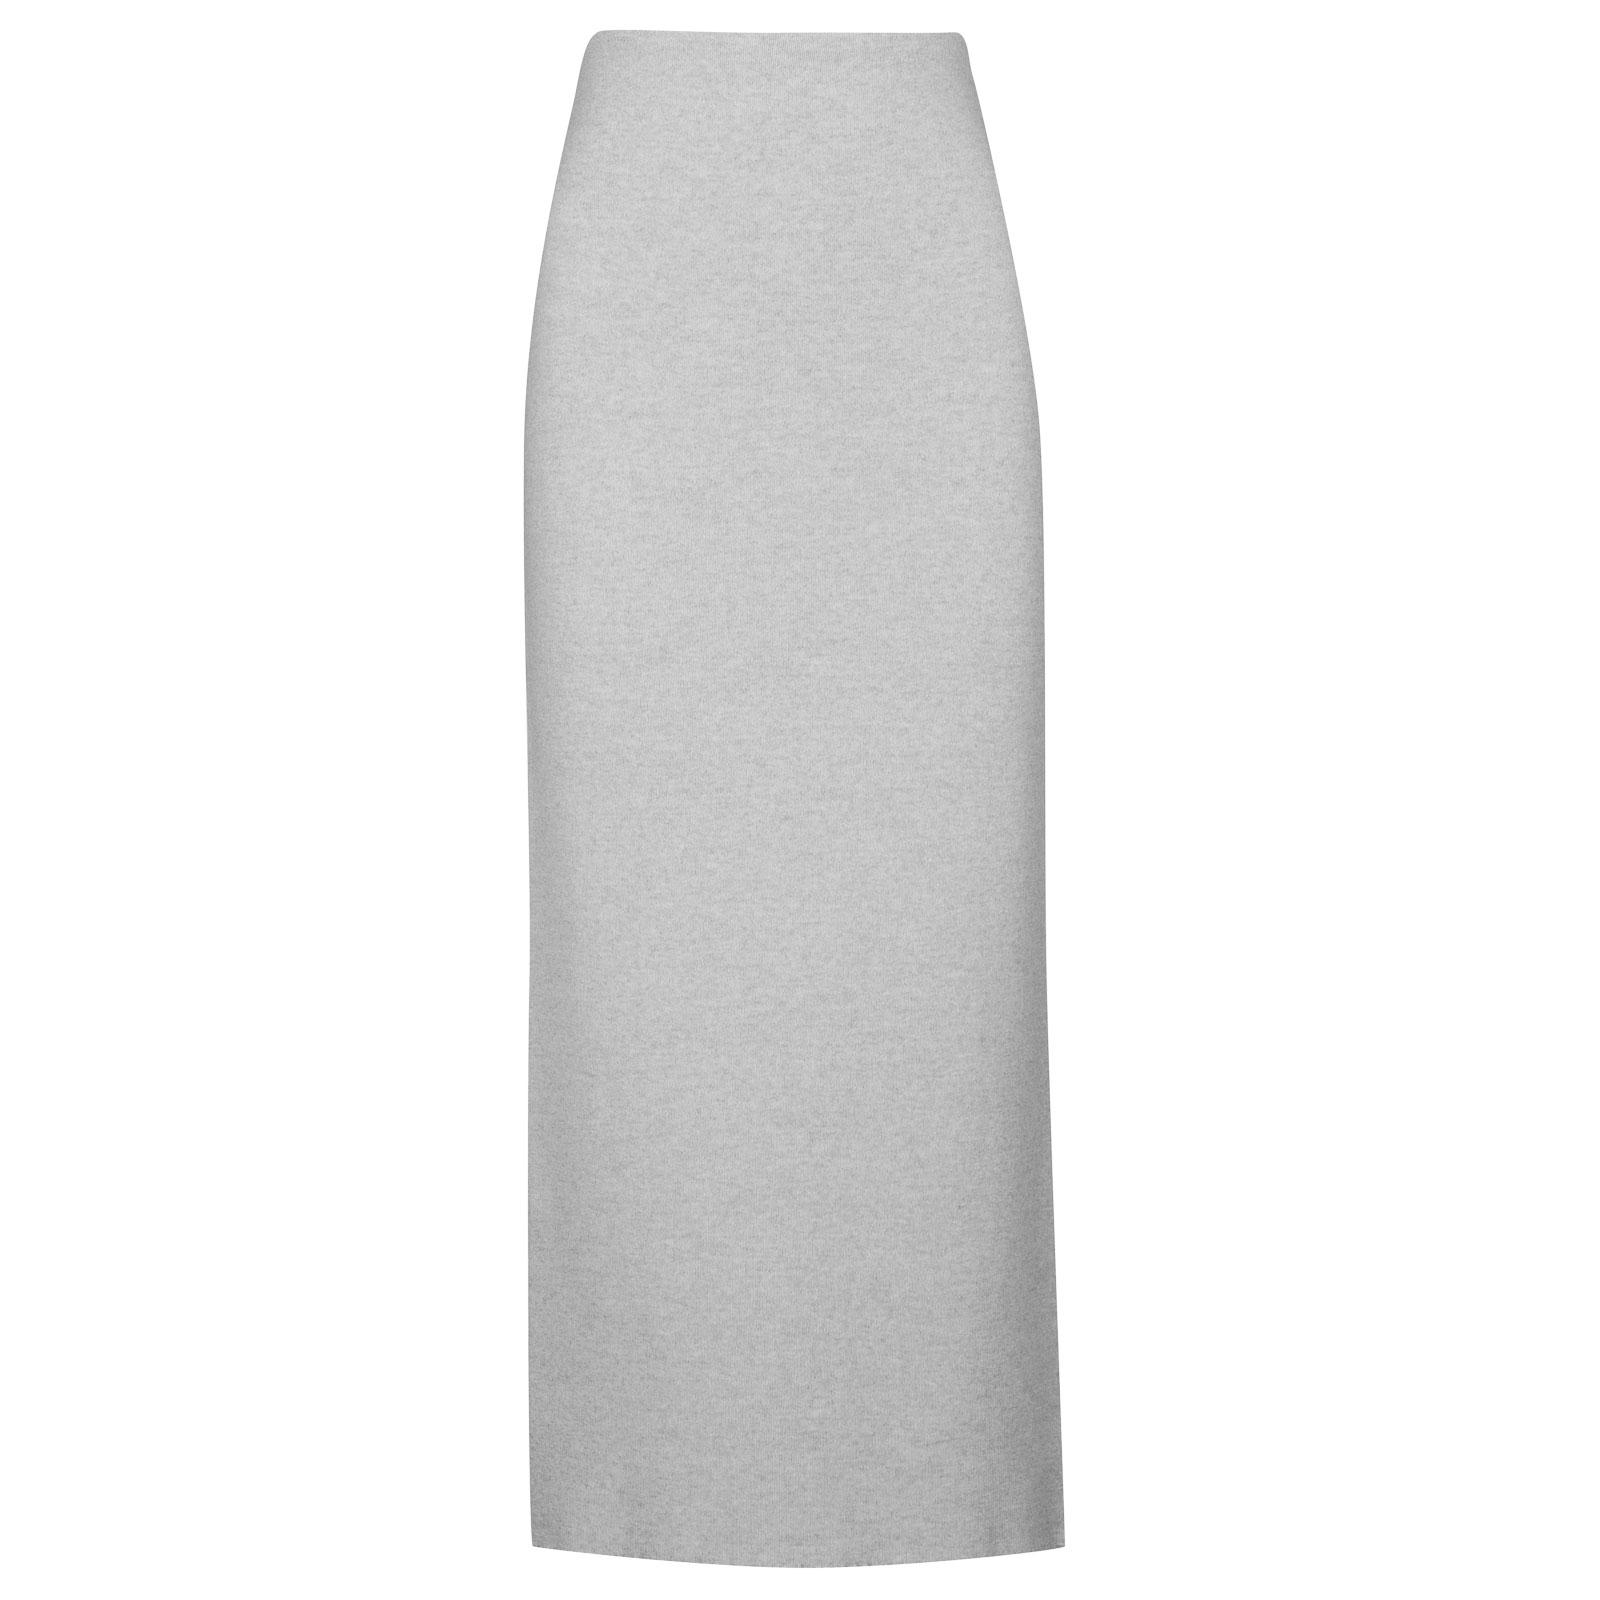 John Smedley moran Merino Wool Skirt in Bardot Grey-XL